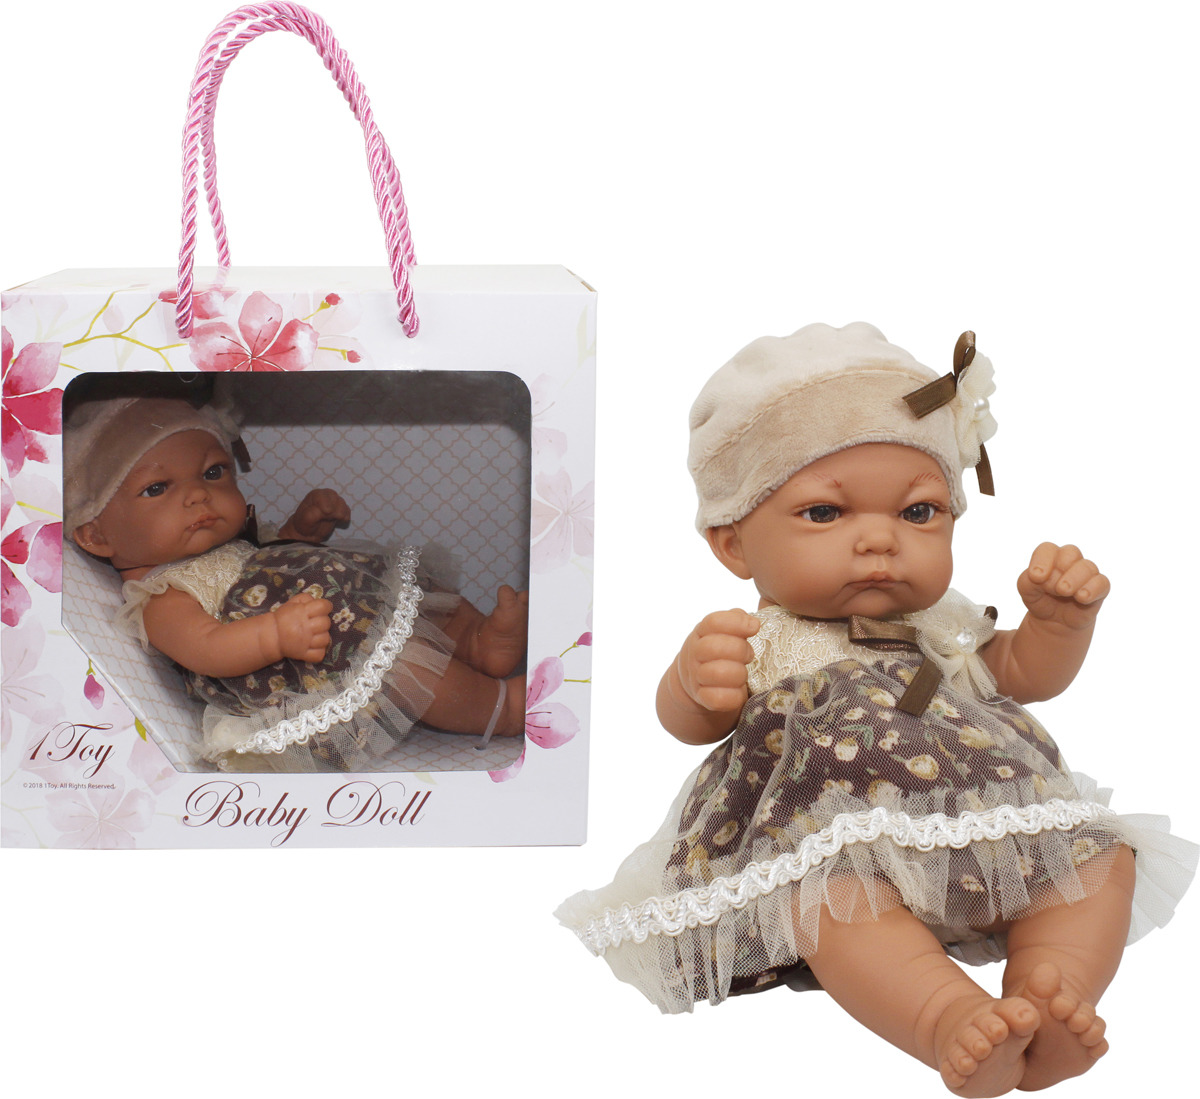 Пупс 1TOY Premium Baby Doll 25 см, Т15459, в нарядном платьице и шапочке